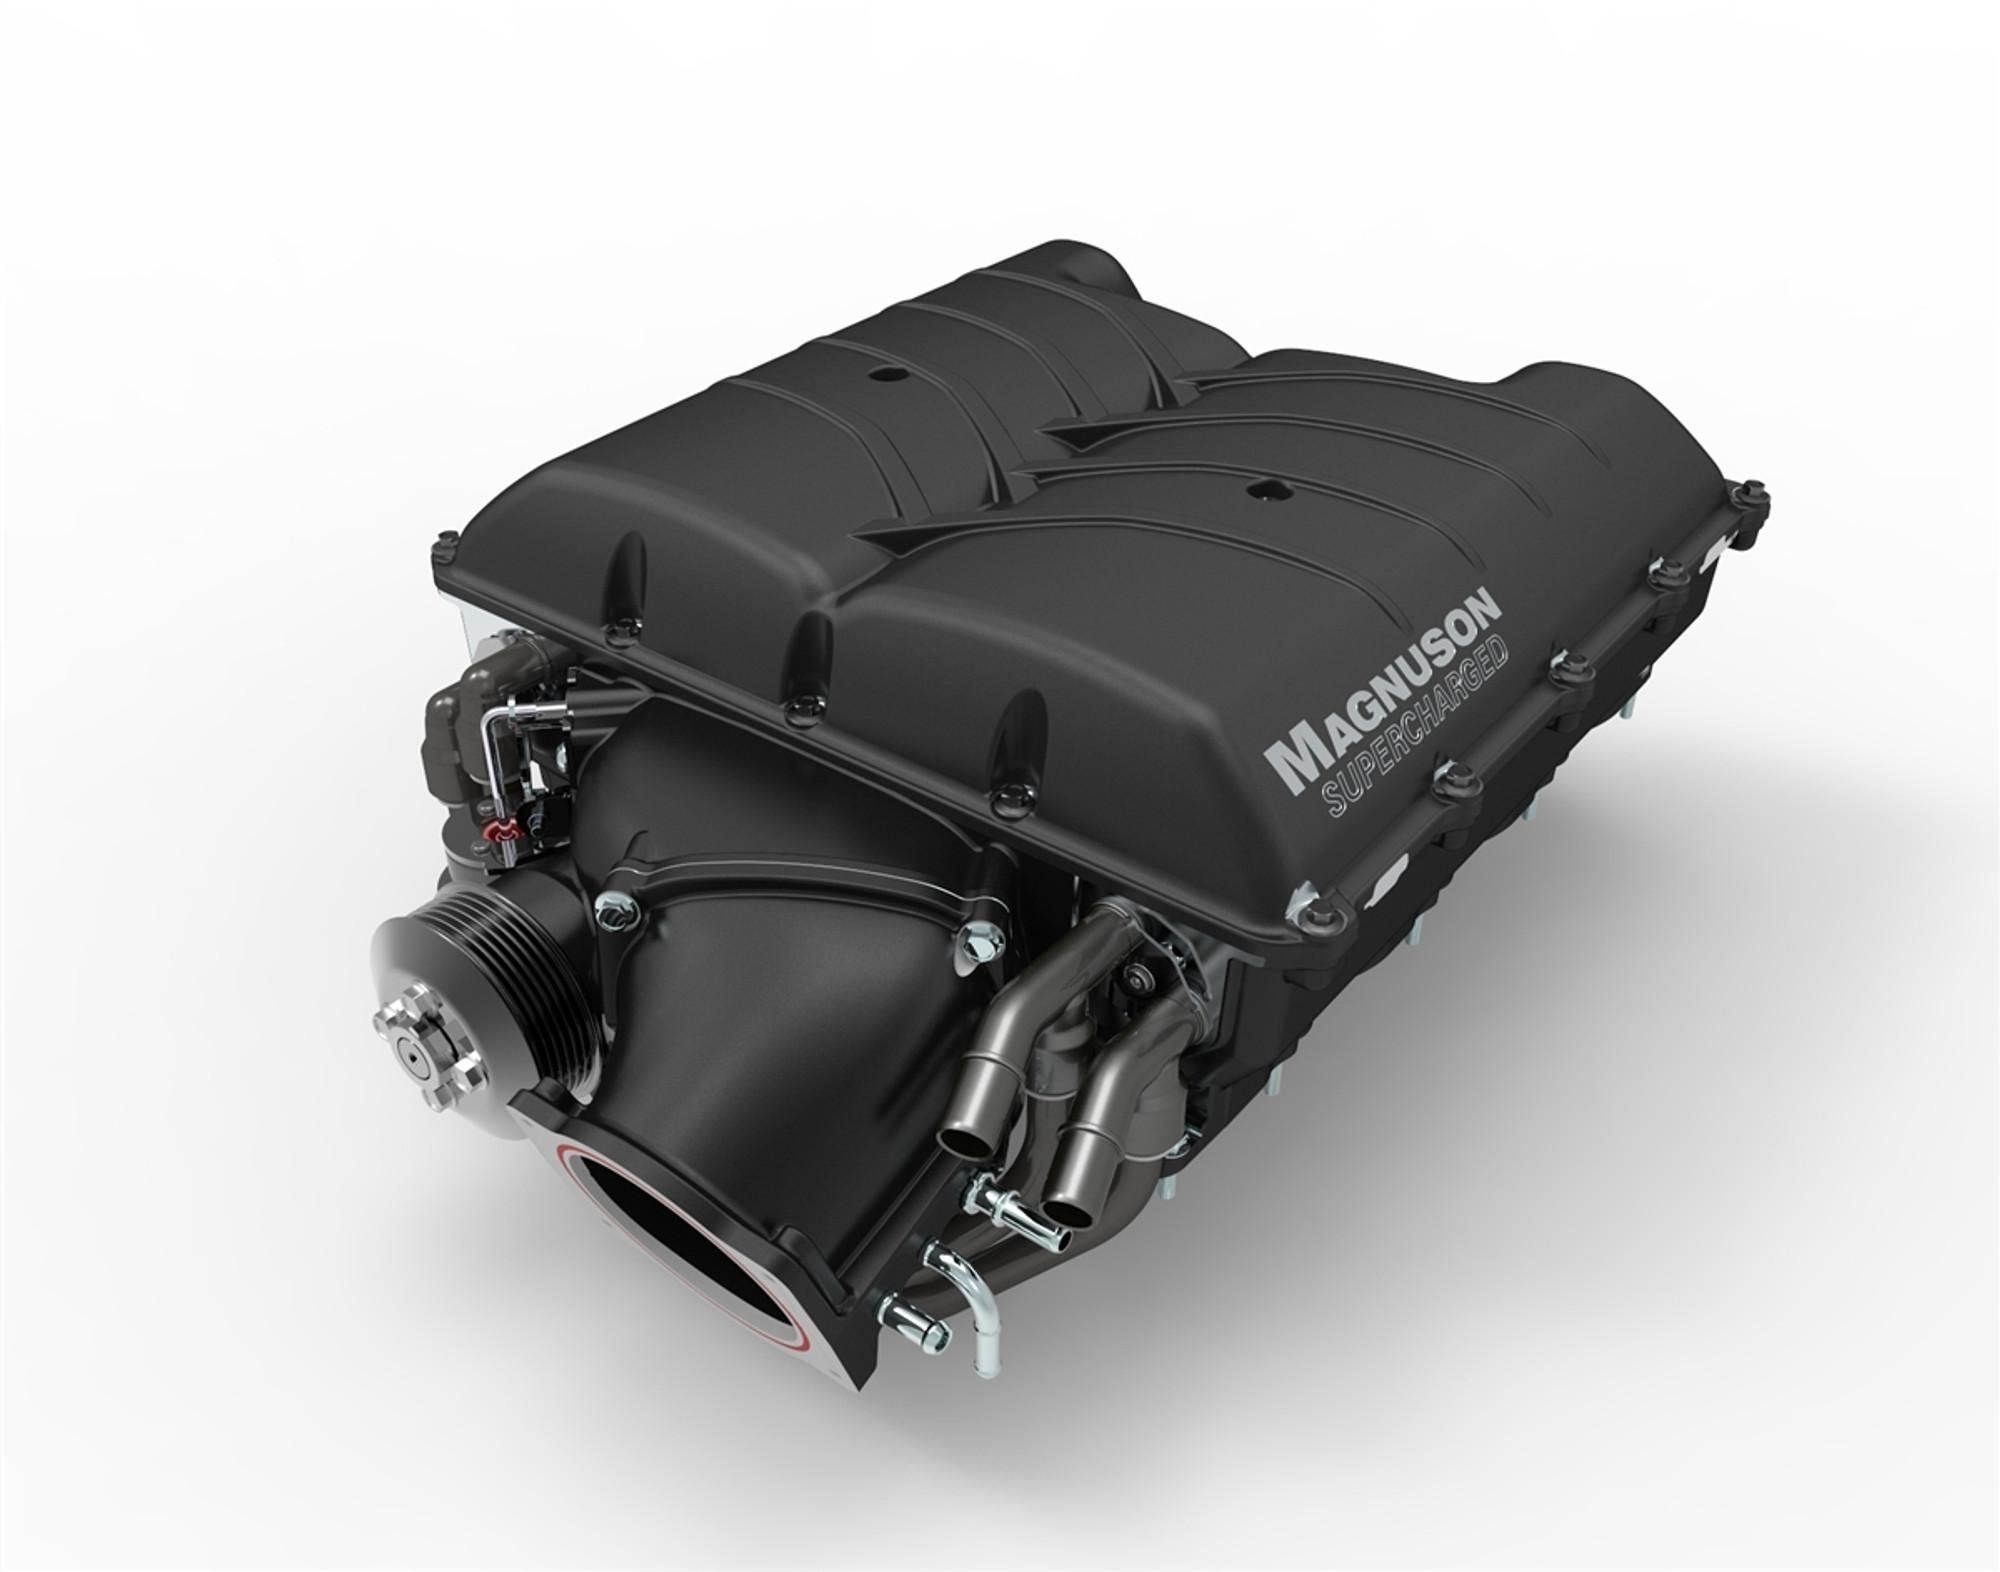 Magnuson TVS 2300 Camaro, HBDI LT1 6 2L (No Tune) Magnacharger Kit  (2016-2017)